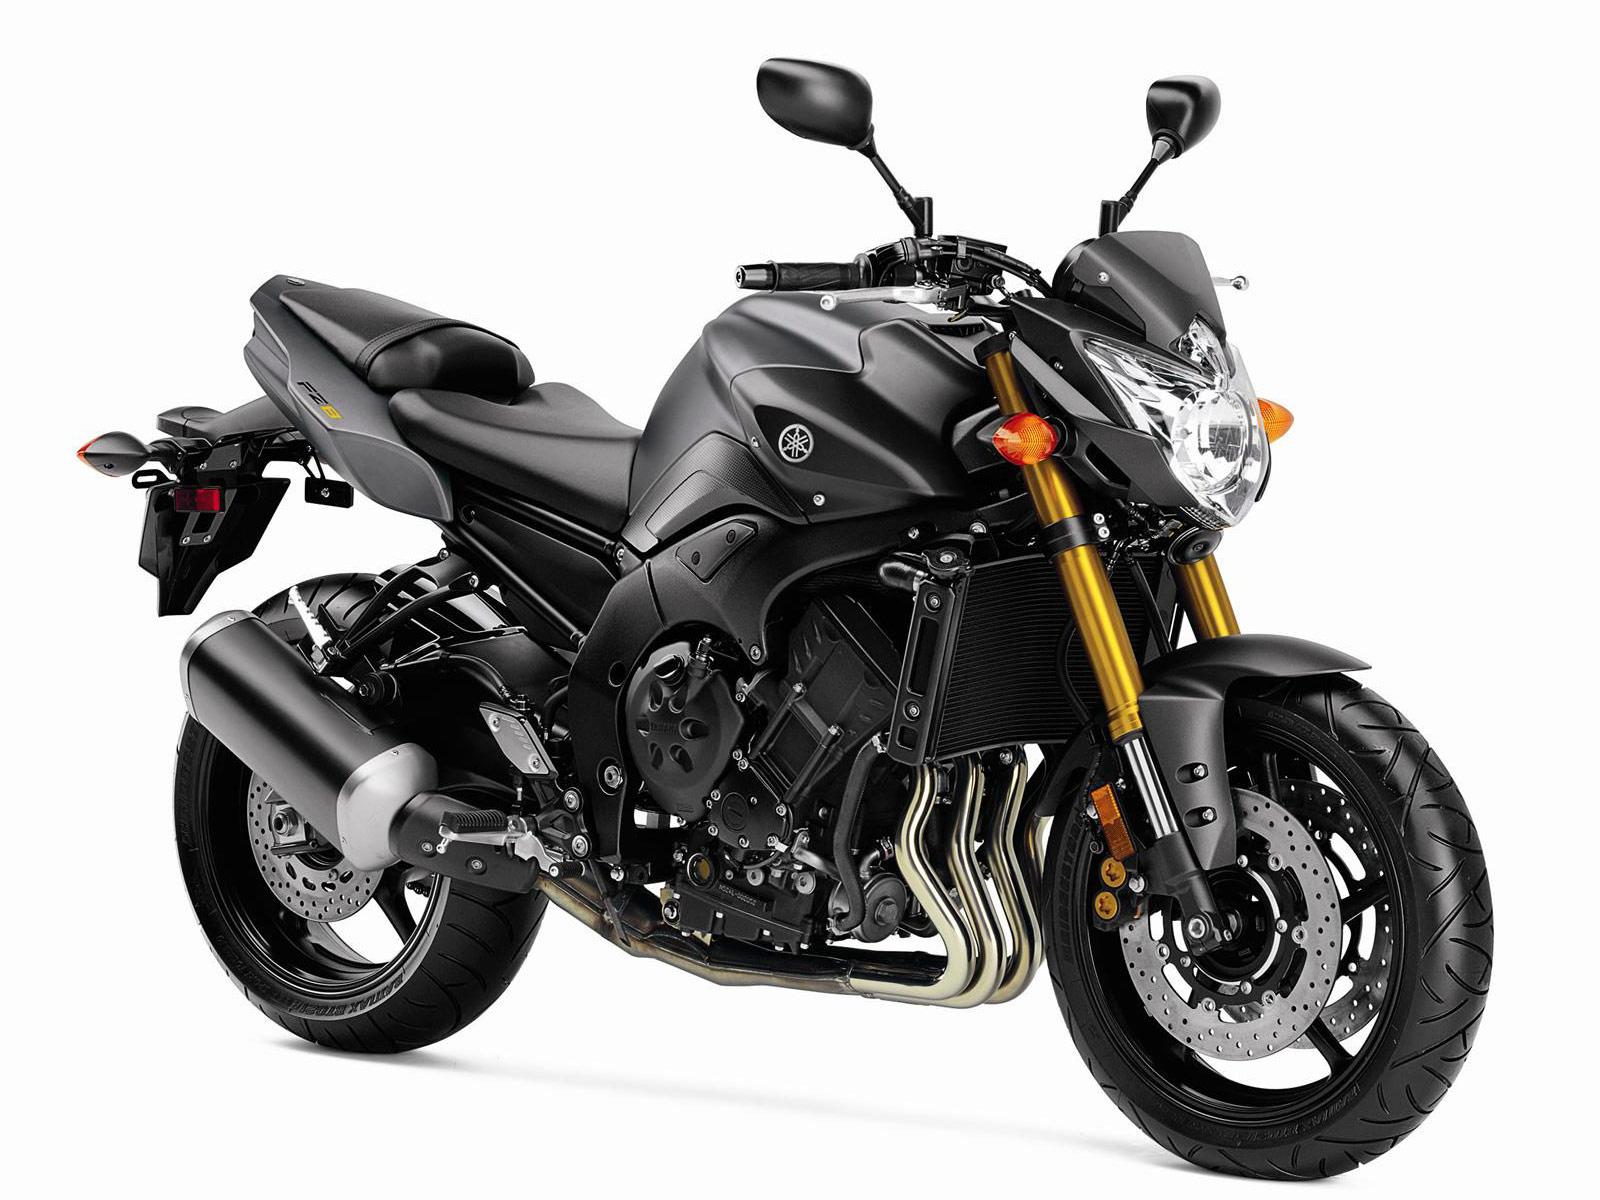 2012 Yamaha FZ8 WGP 50th Anniversary | motorcycle review ...